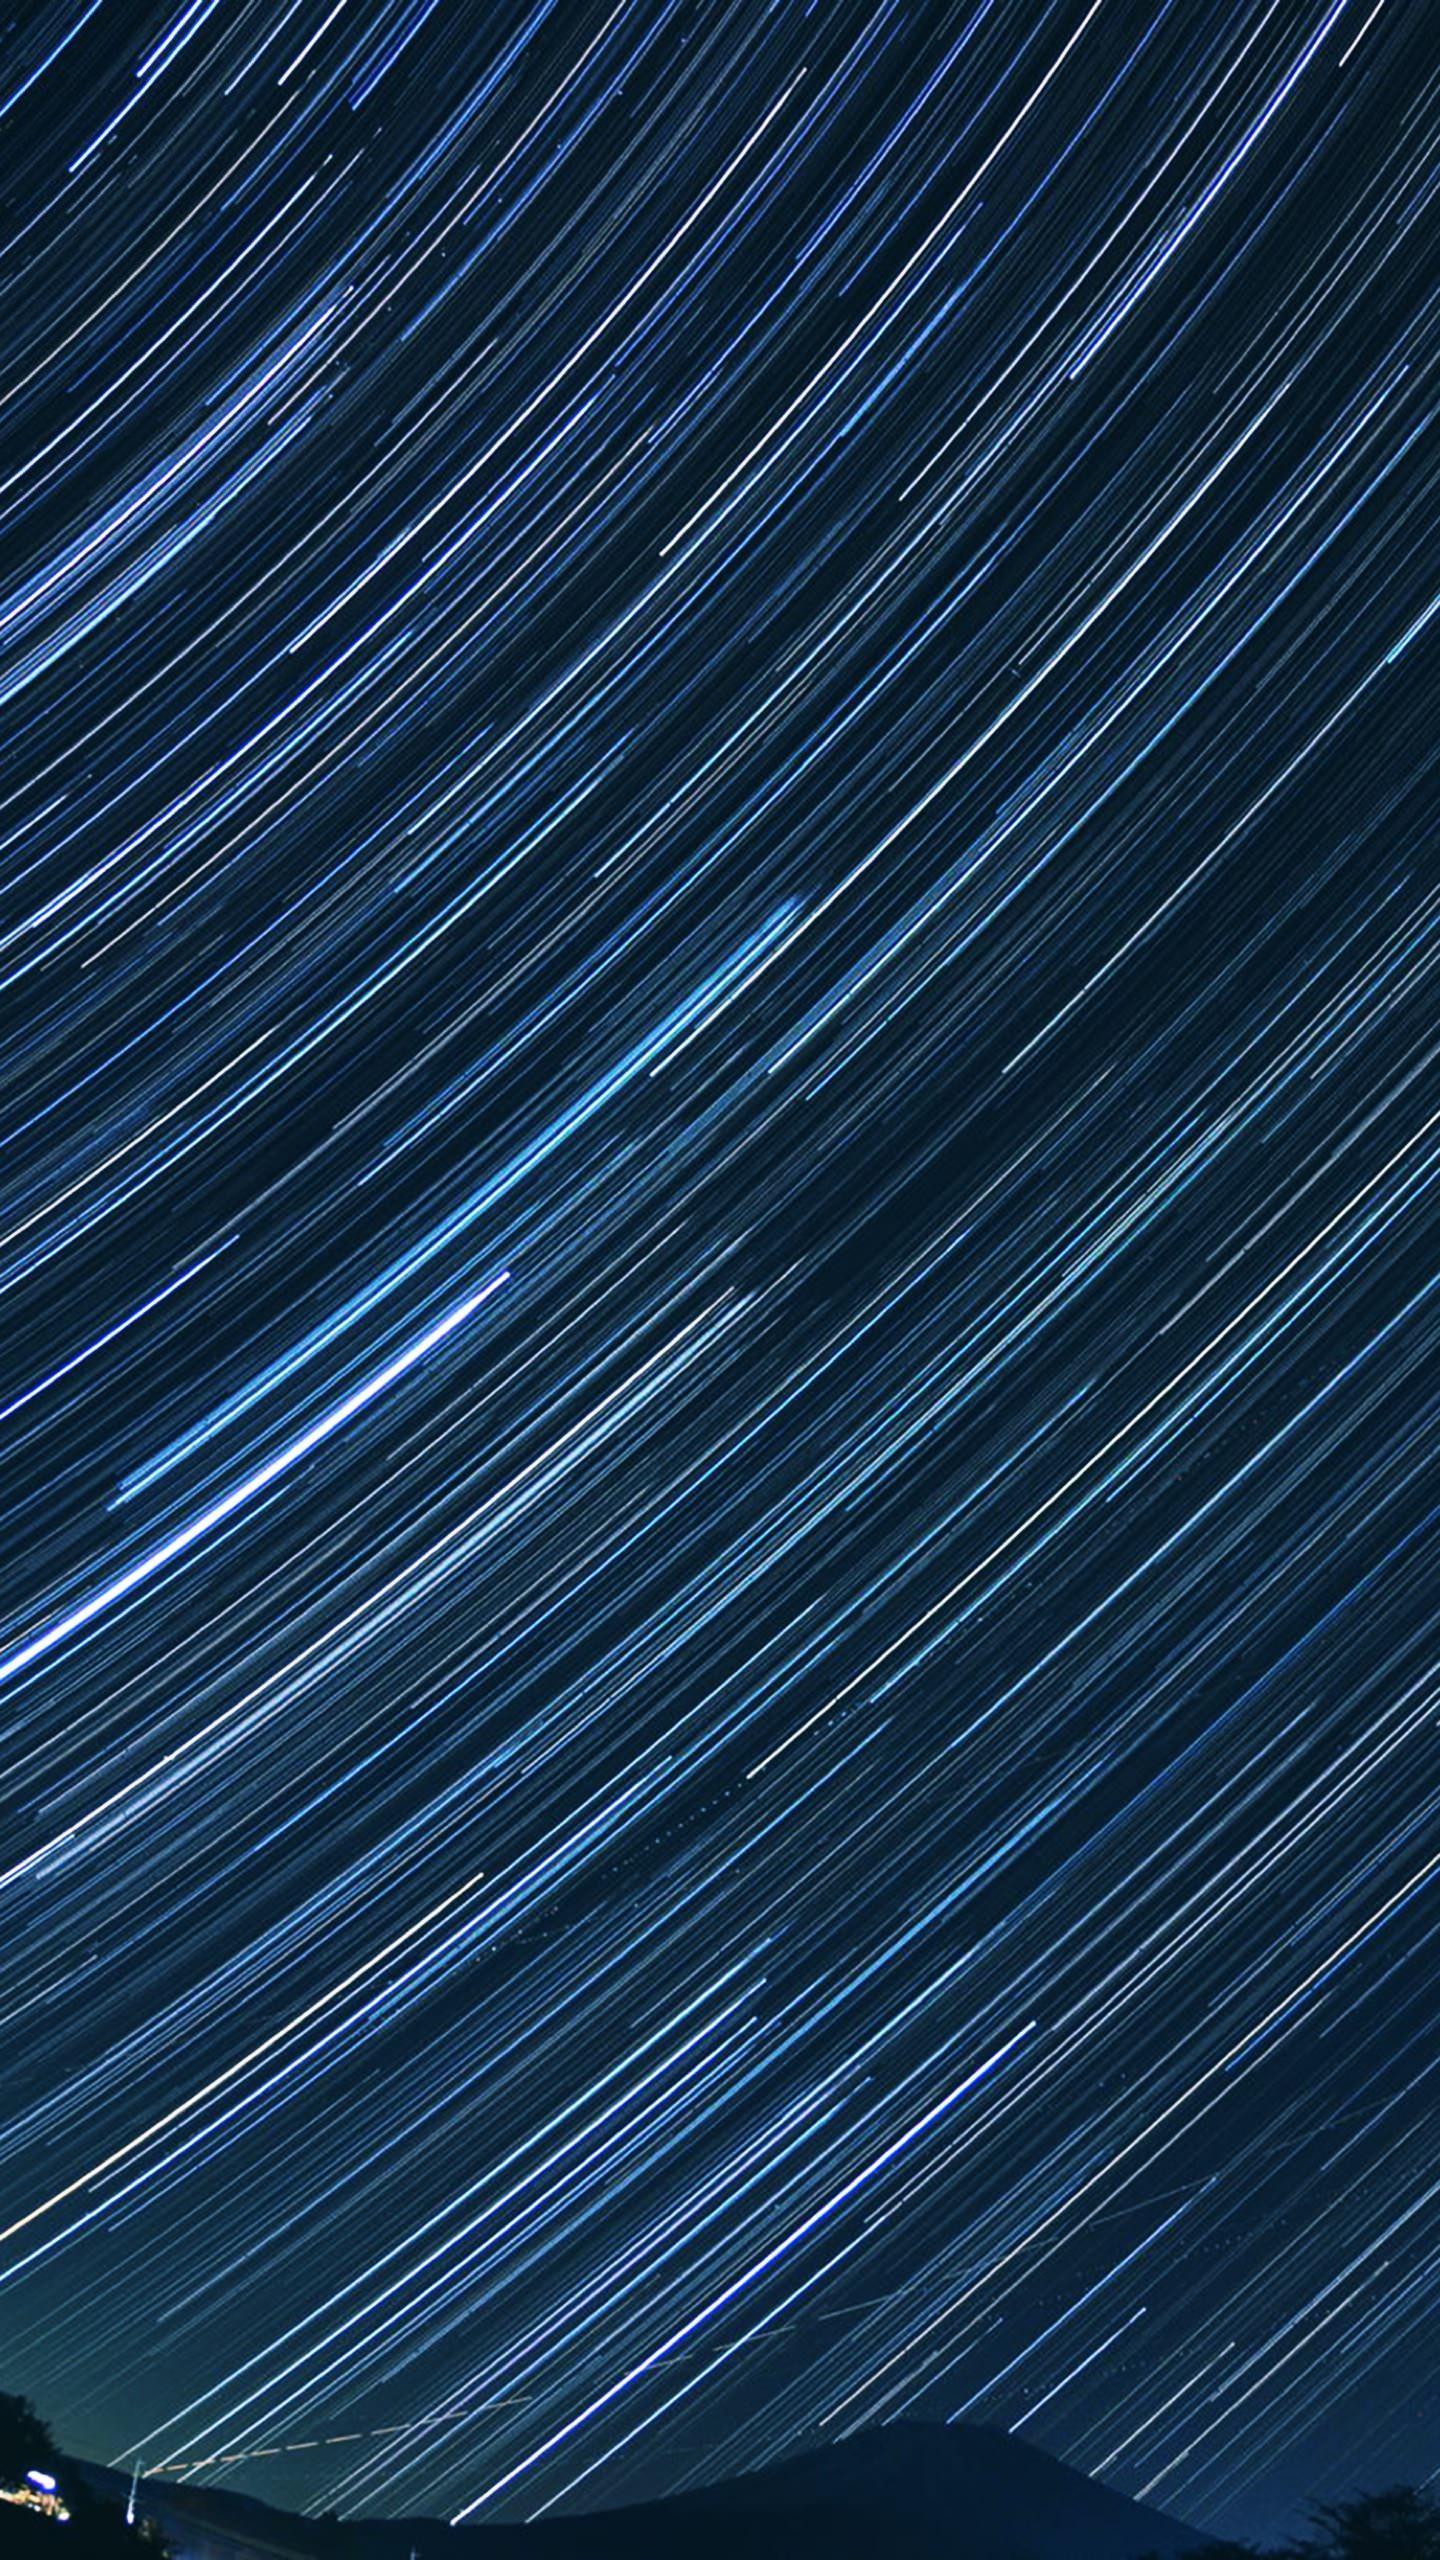 Space star | wallpaper.sc SmartPhone